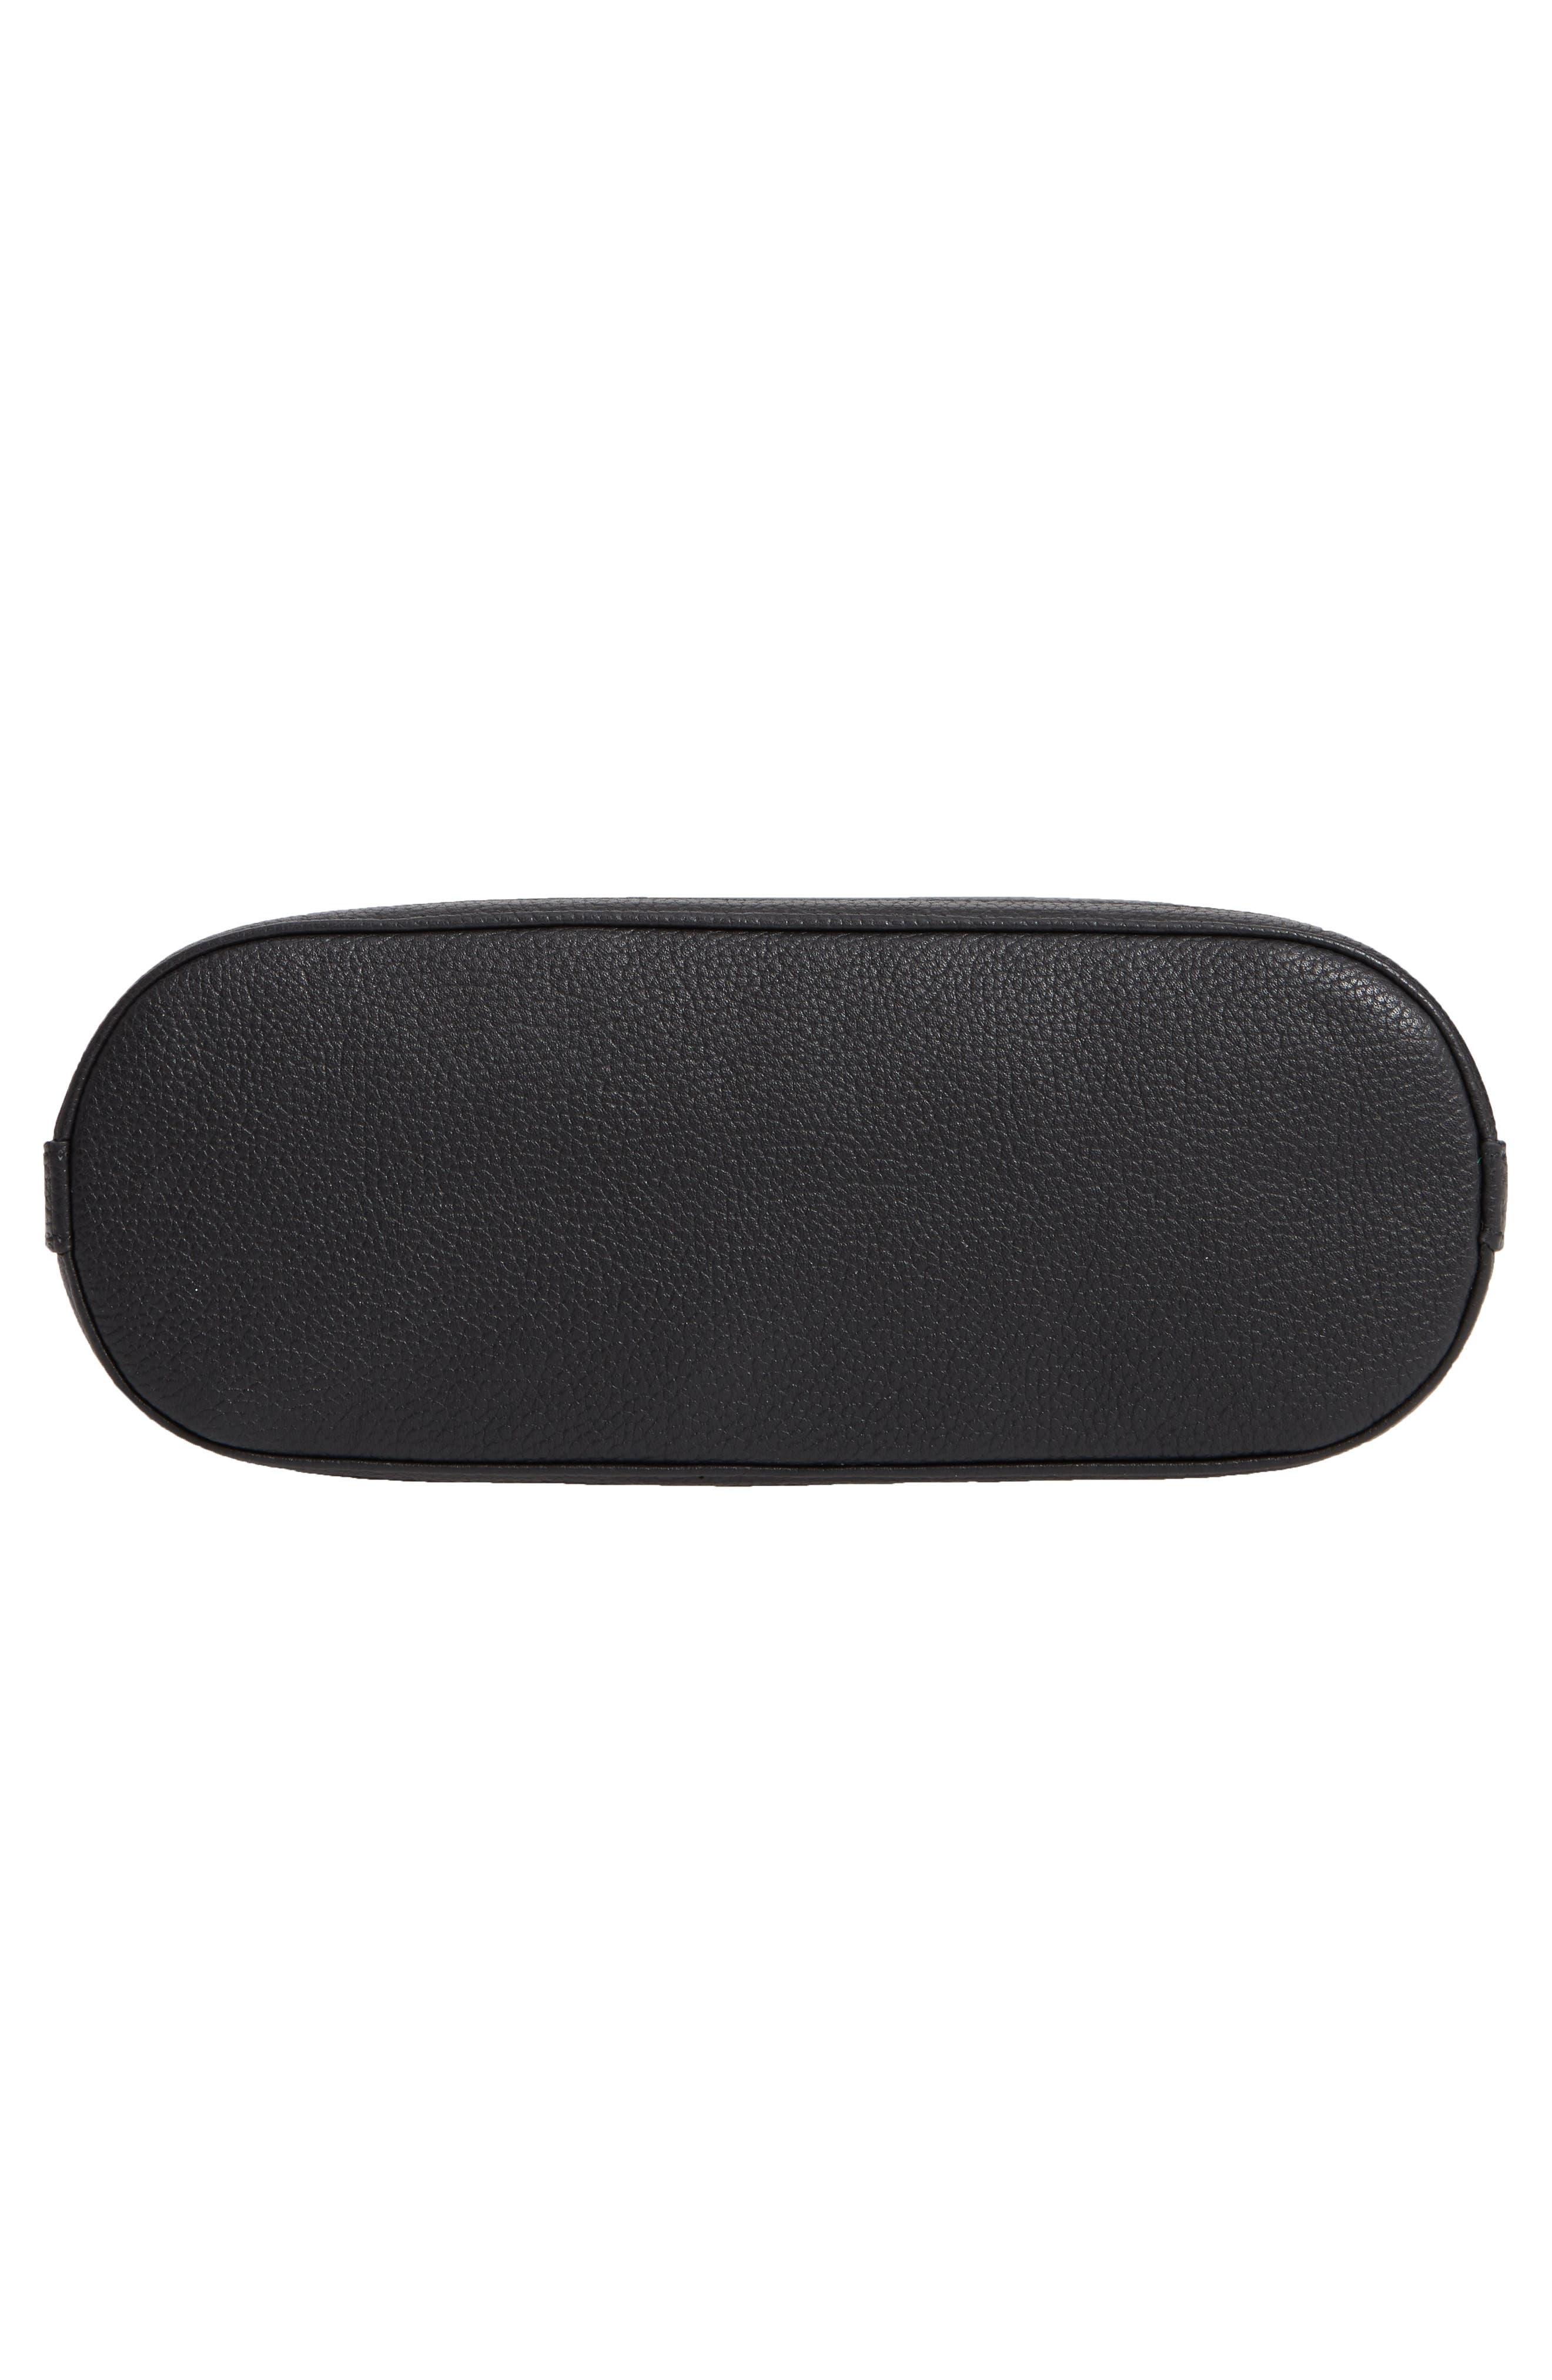 Maribel Leather Crossbody Bag,                             Alternate thumbnail 6, color,                             BLACK